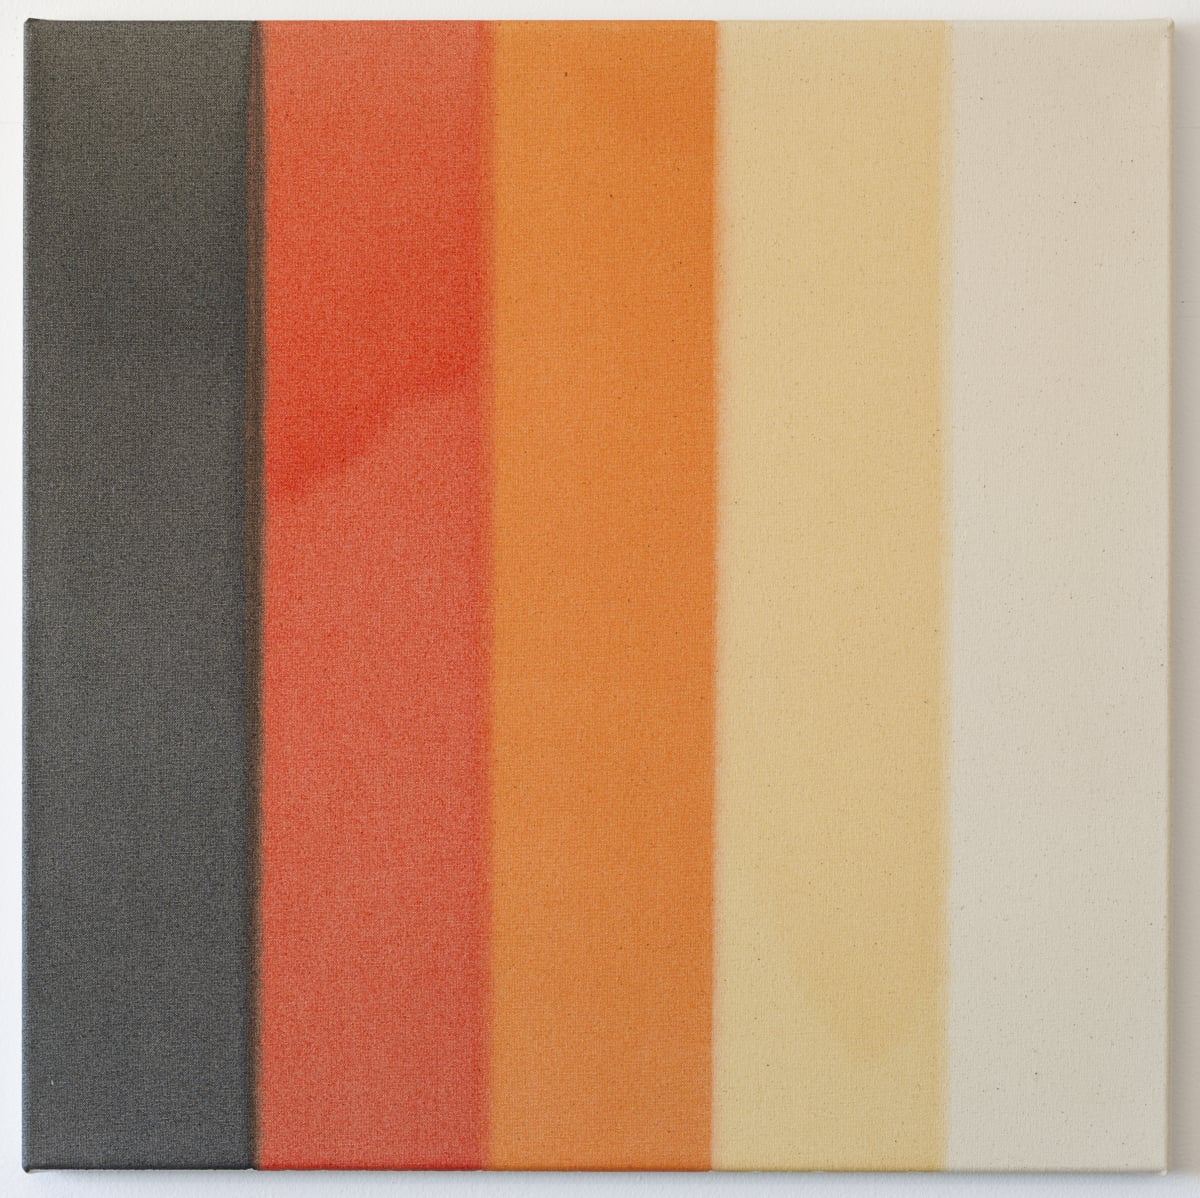 Simon Morris Colour Order 2, 2015 Acrylic on canvas 30.5 x 30.5 in 77.5 x 77.5 cm